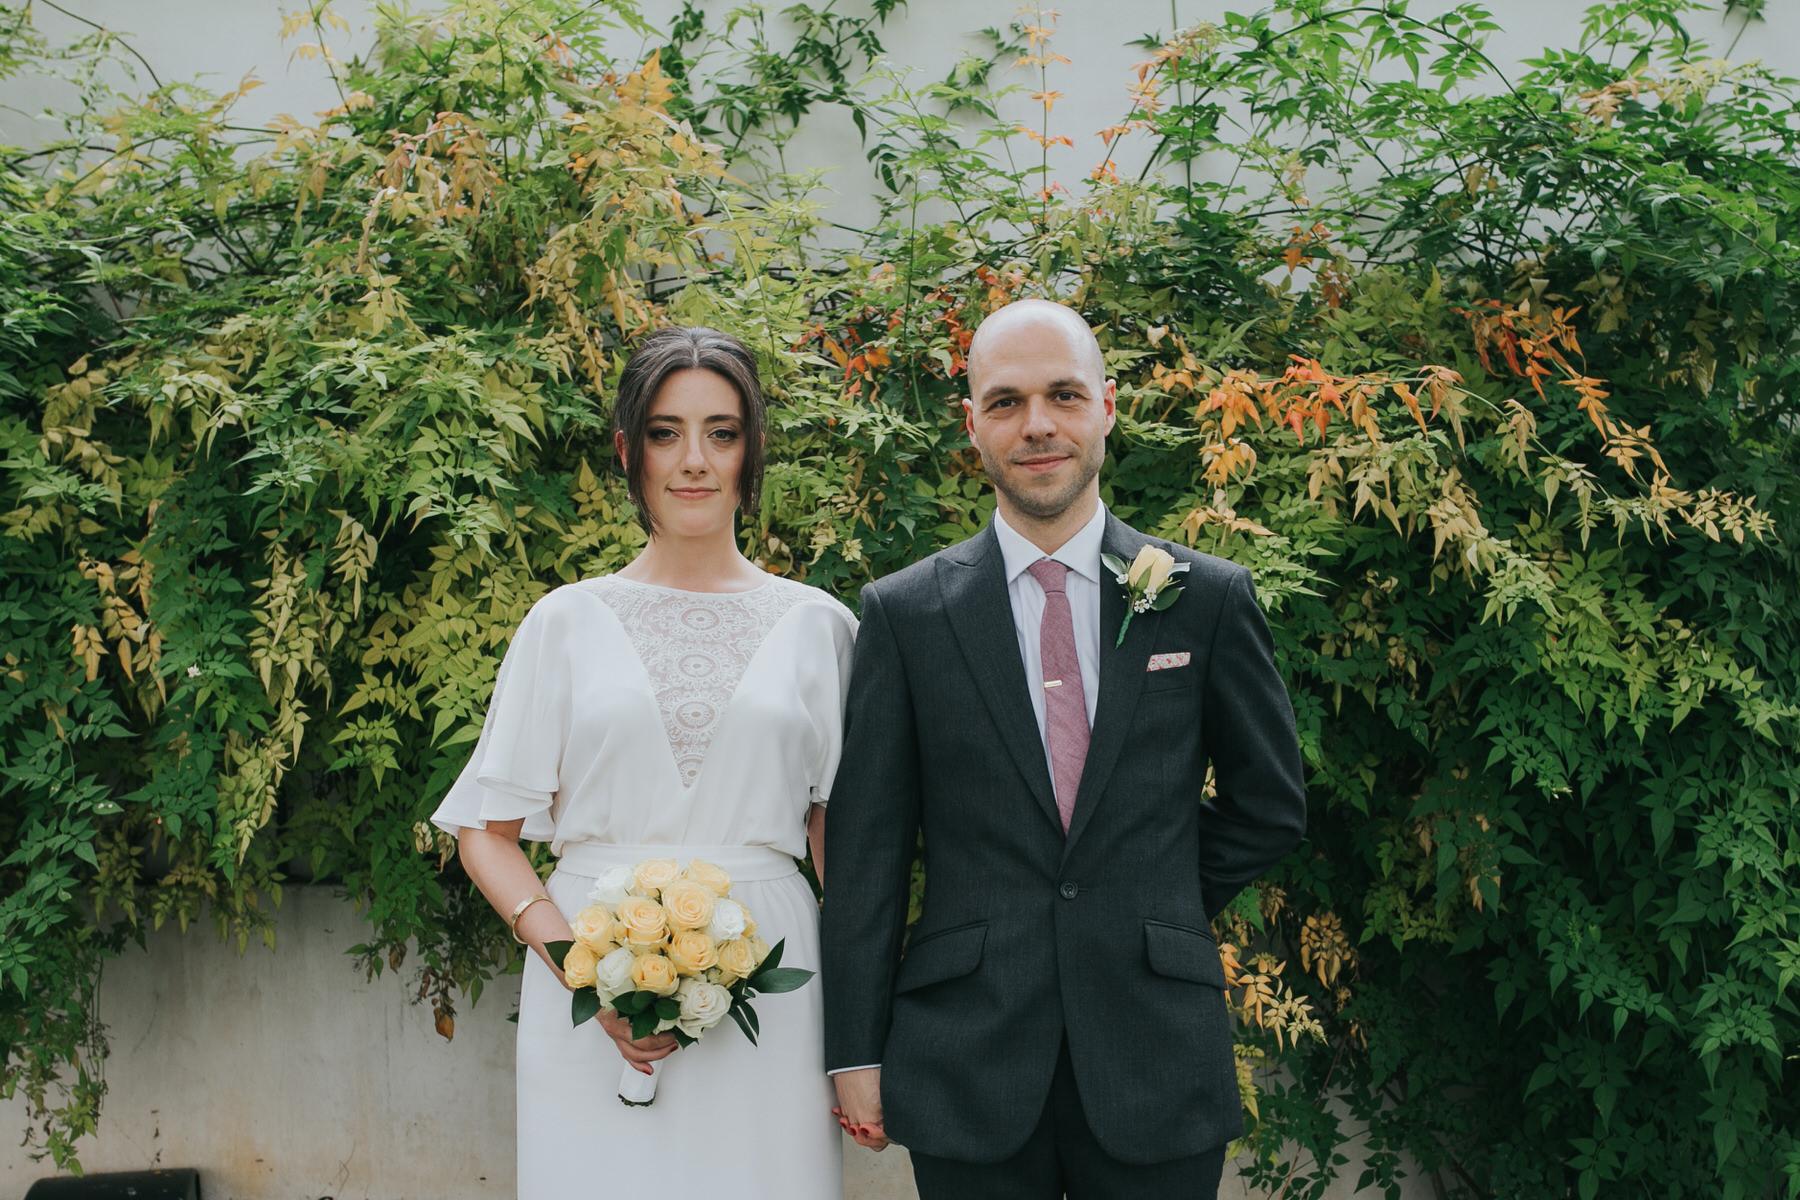 128 green orange fern ivy bride groom portrait.jpg